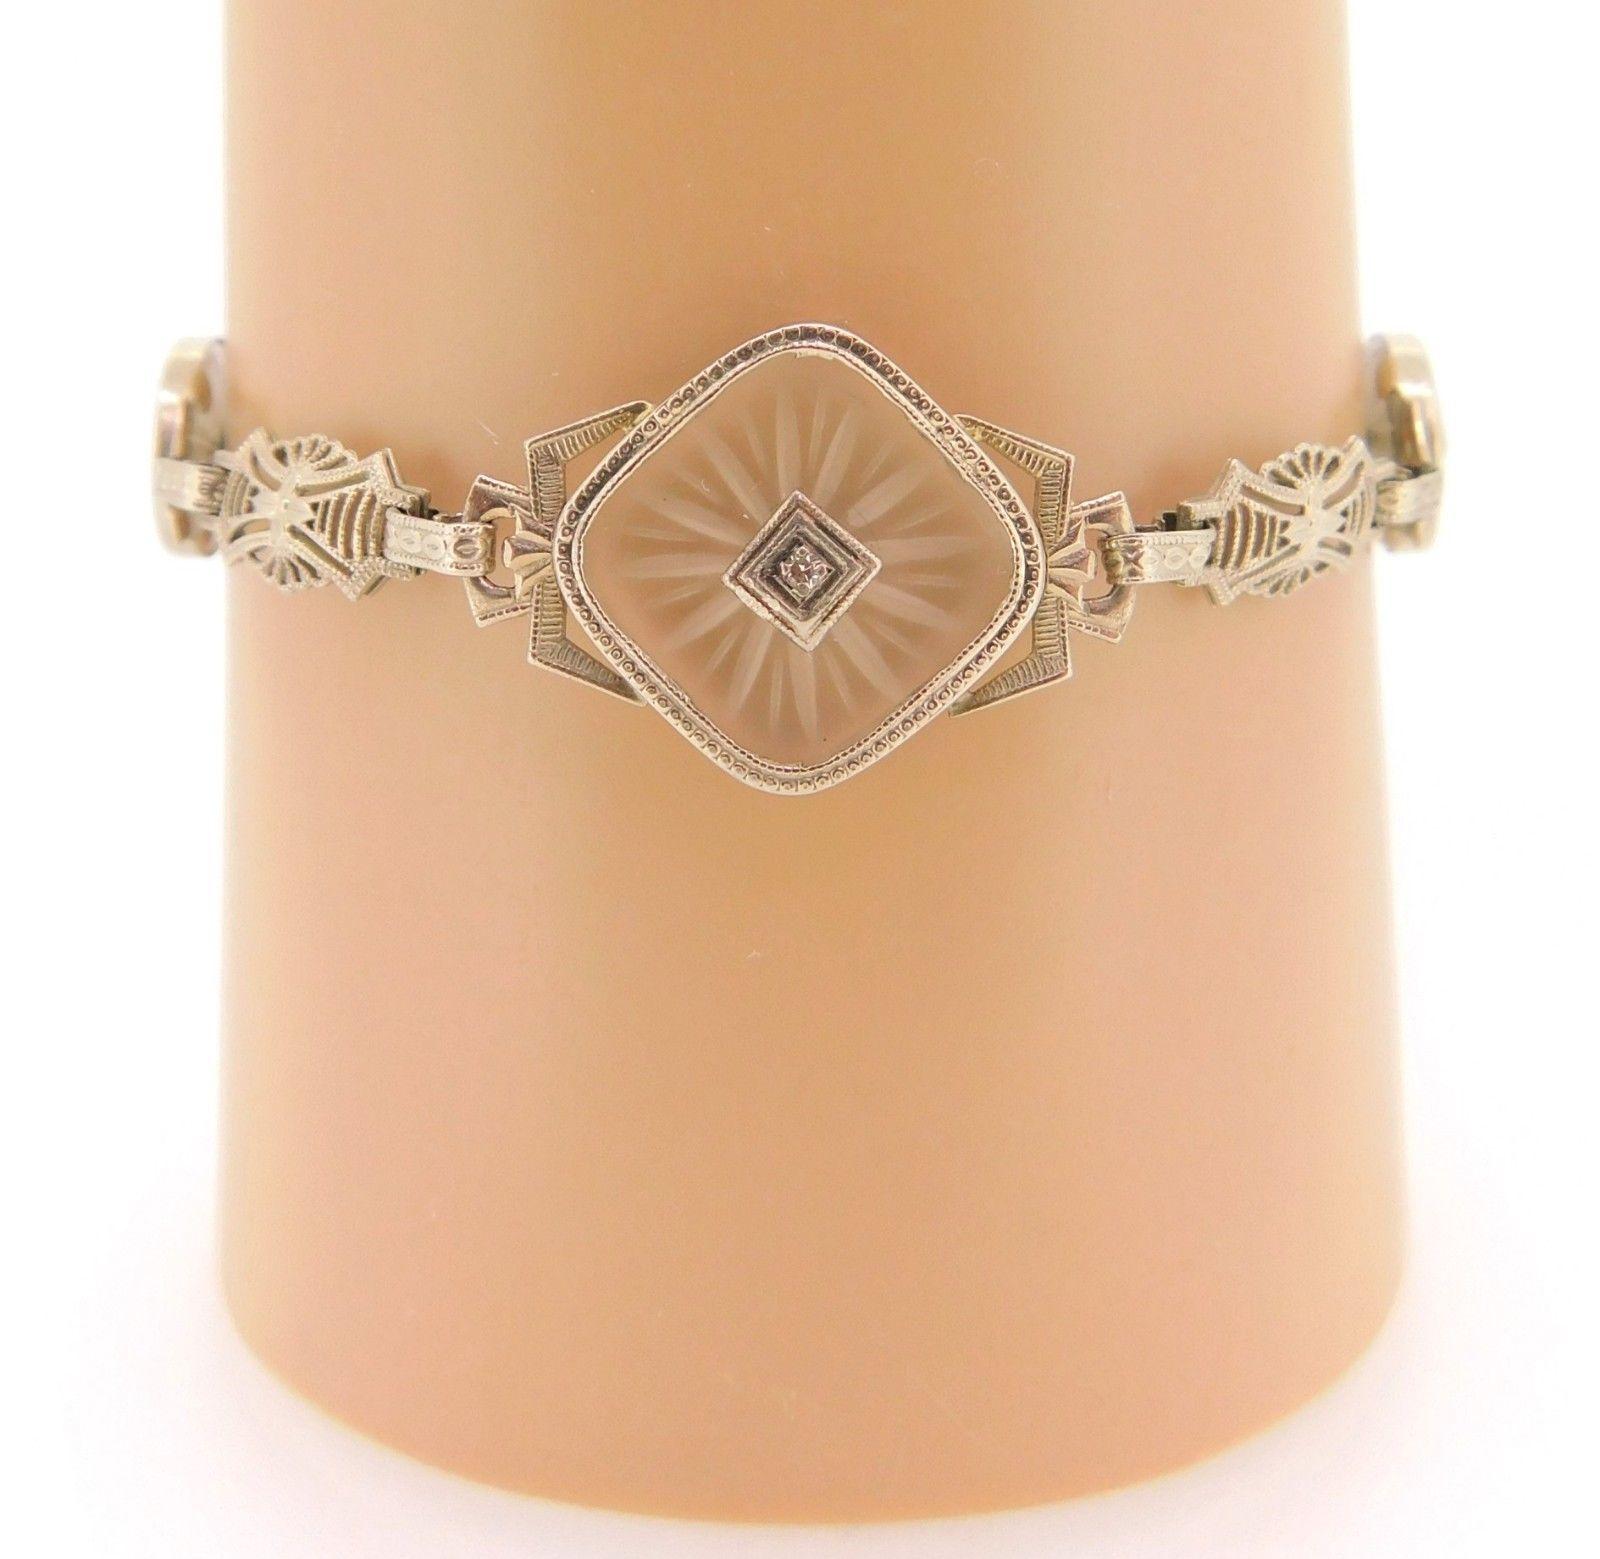 14k Gold Filigree Art Deco Genuine Rock Crystal Bracelet with Diamonds (#J4021)